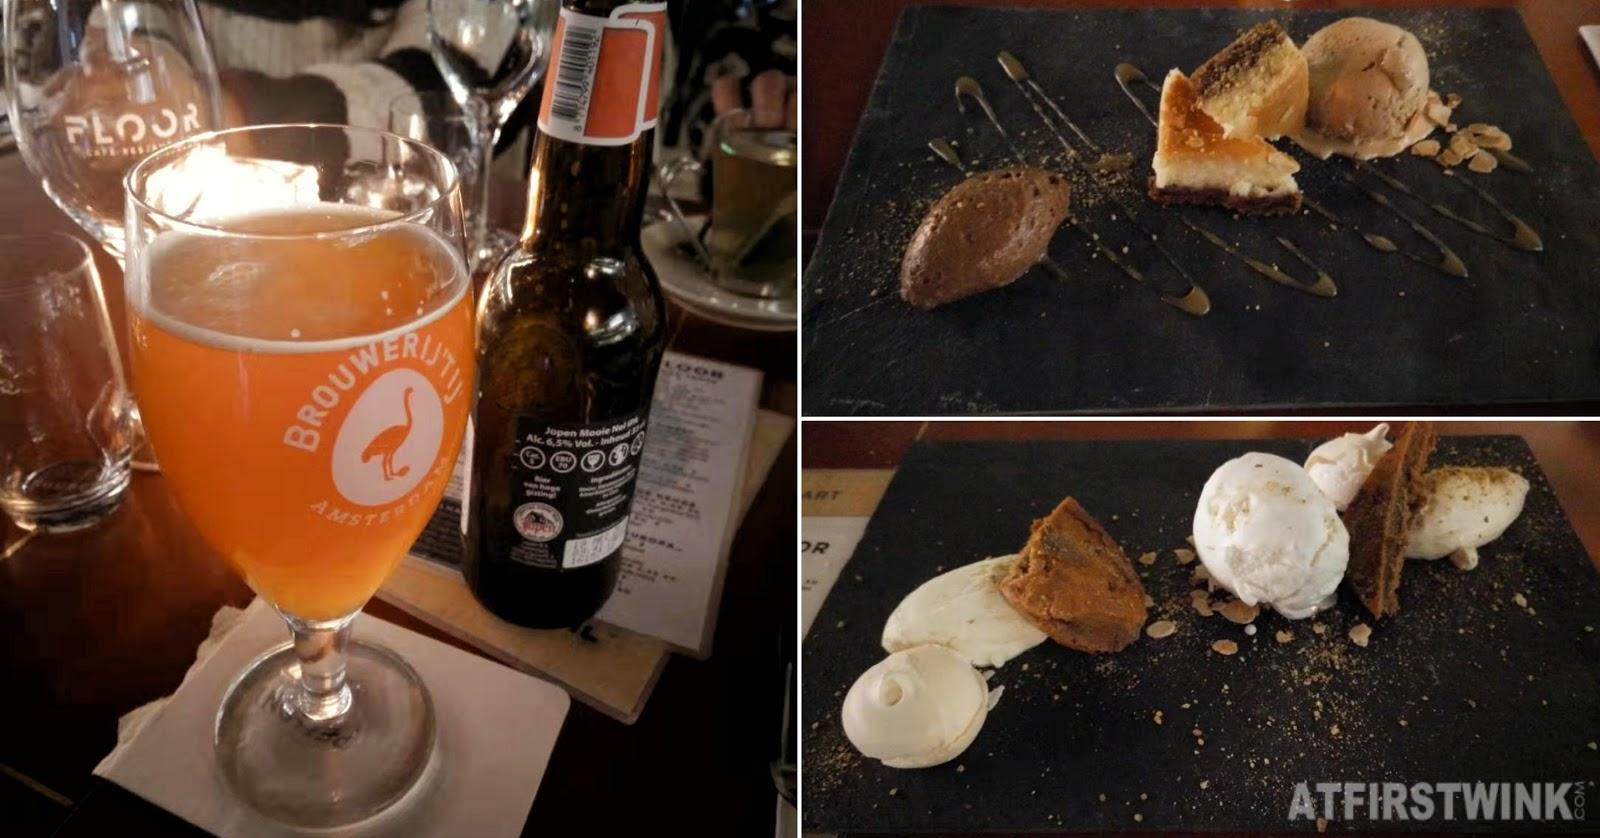 Floor restaurant Rotterdam beer desserts